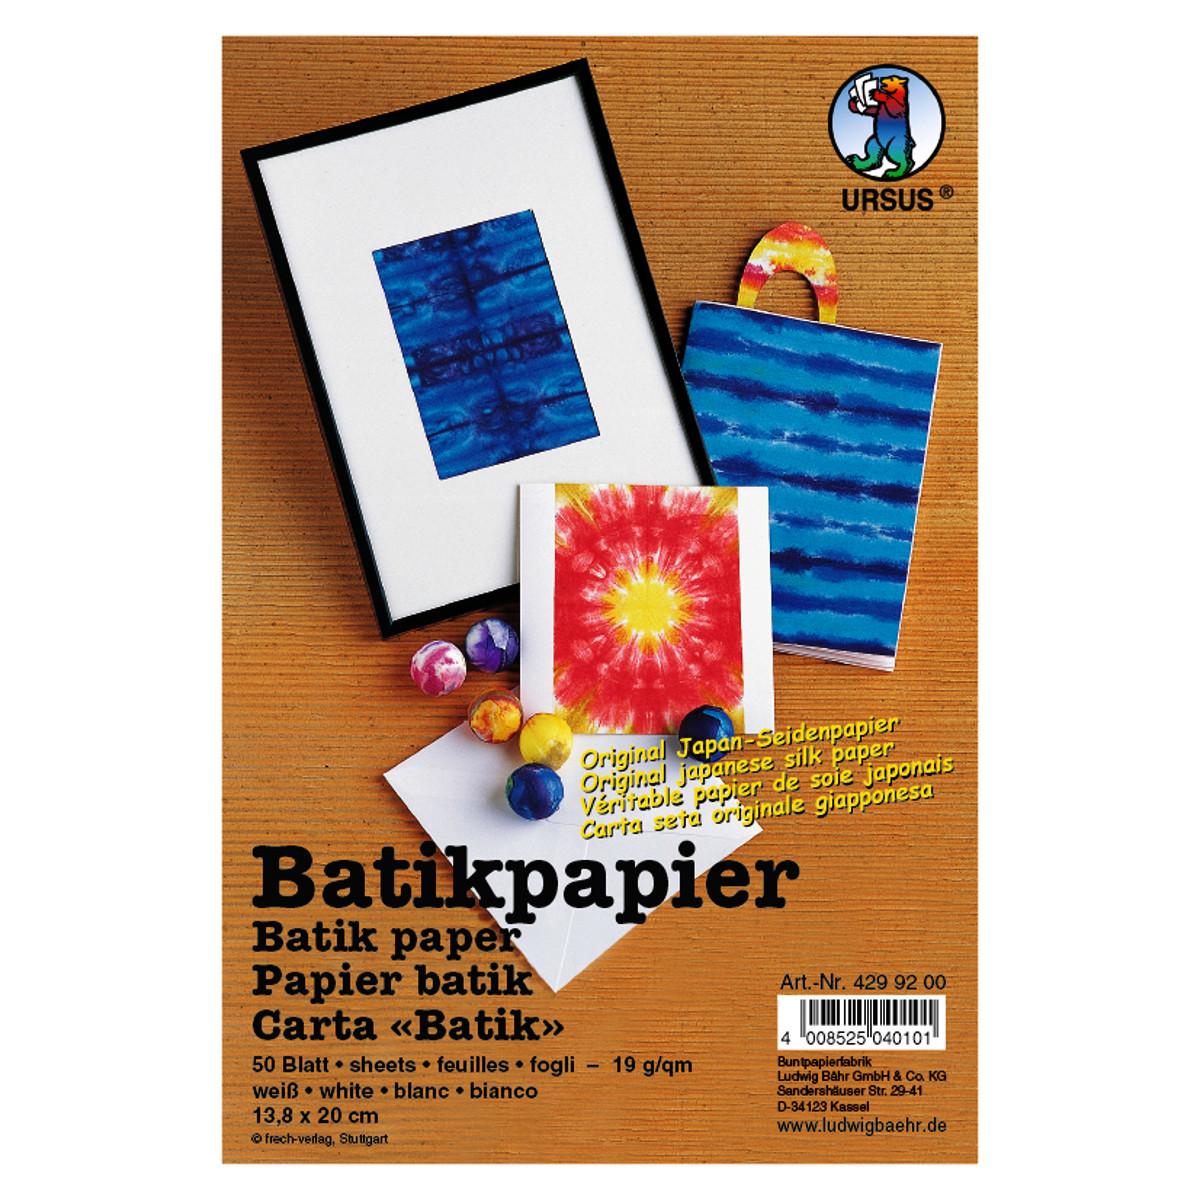 Batikpapier 19 g/qm 9,5 x 13,8 cm - 100 Blatt